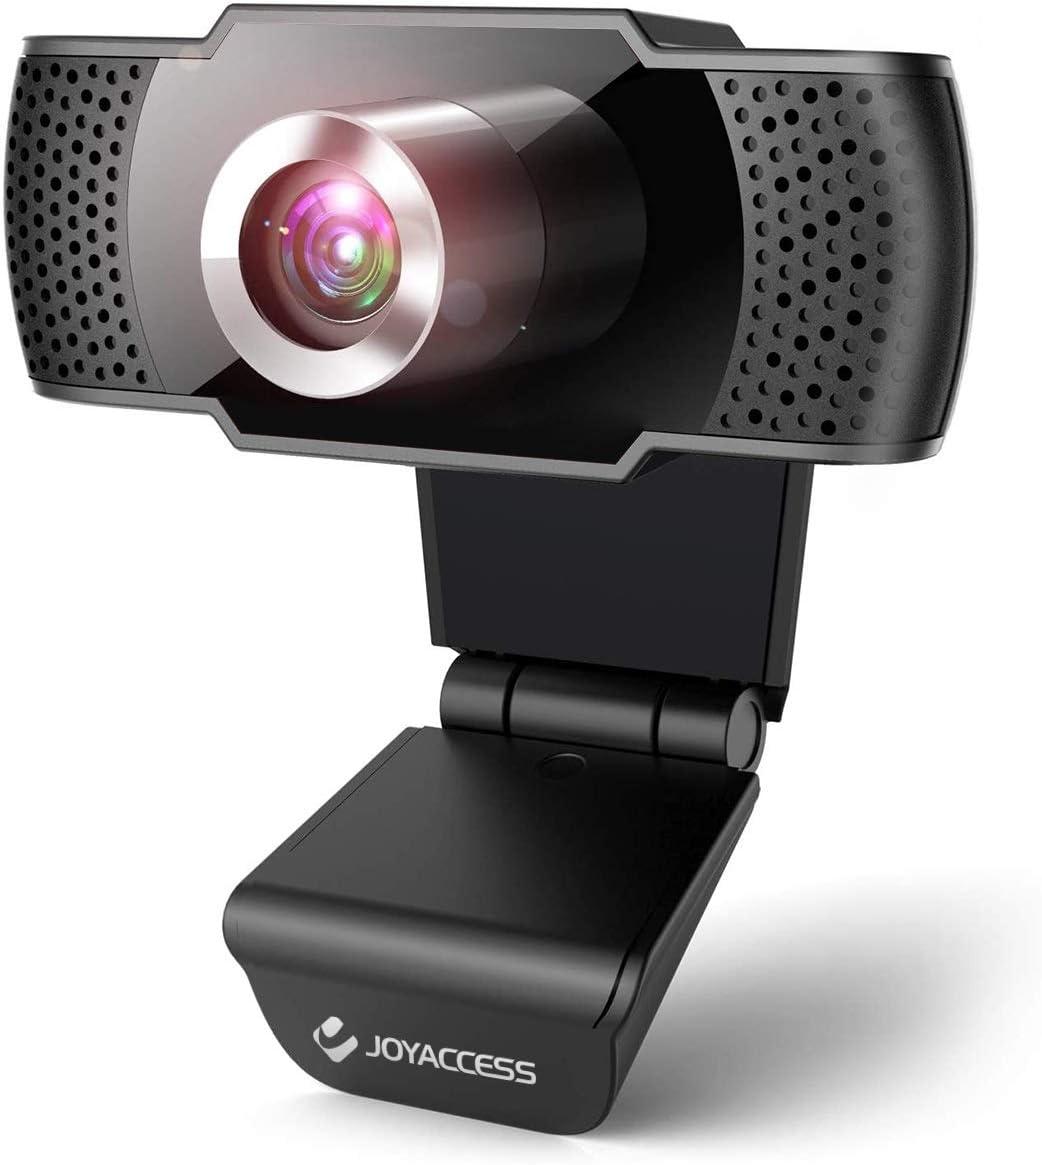 Webcam con microfono para pc, Web cámara 1080p Full HD con micrófono reducción de Ruido, Vista Gran Angular de 105º para Streaming, conferencias en Zoom, Youtube, Skype, Compatible con Windows, Mac